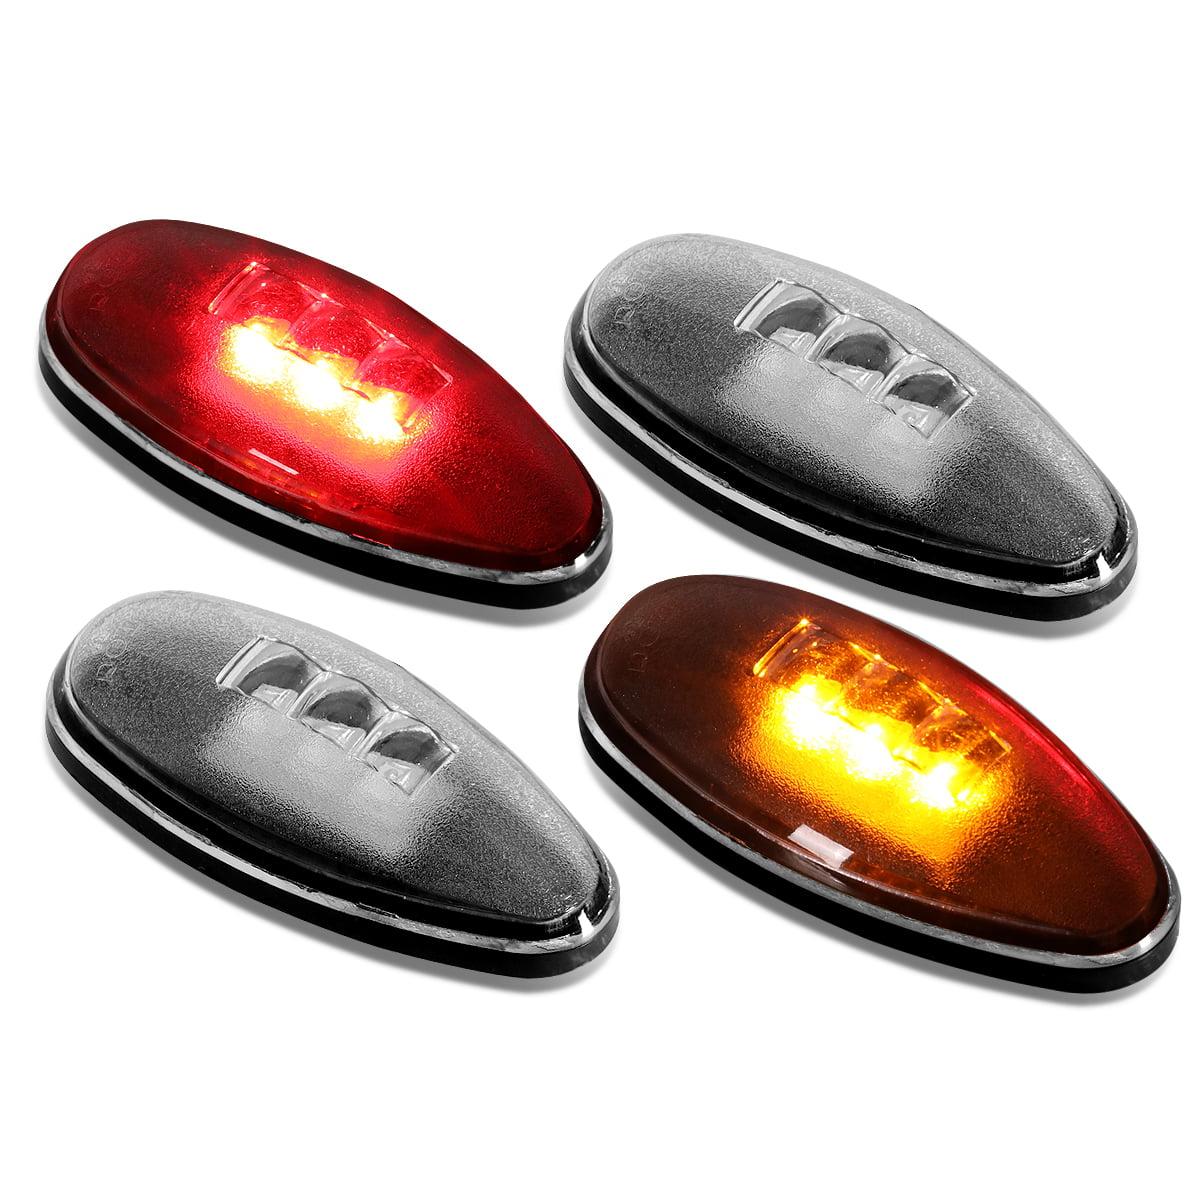 For 2001-2014 Chevy Silverado/GMC Sierra LED Dually Bed Fender Side Marker Light Set 03 04 05 06 07 08 09 10 11 12 13